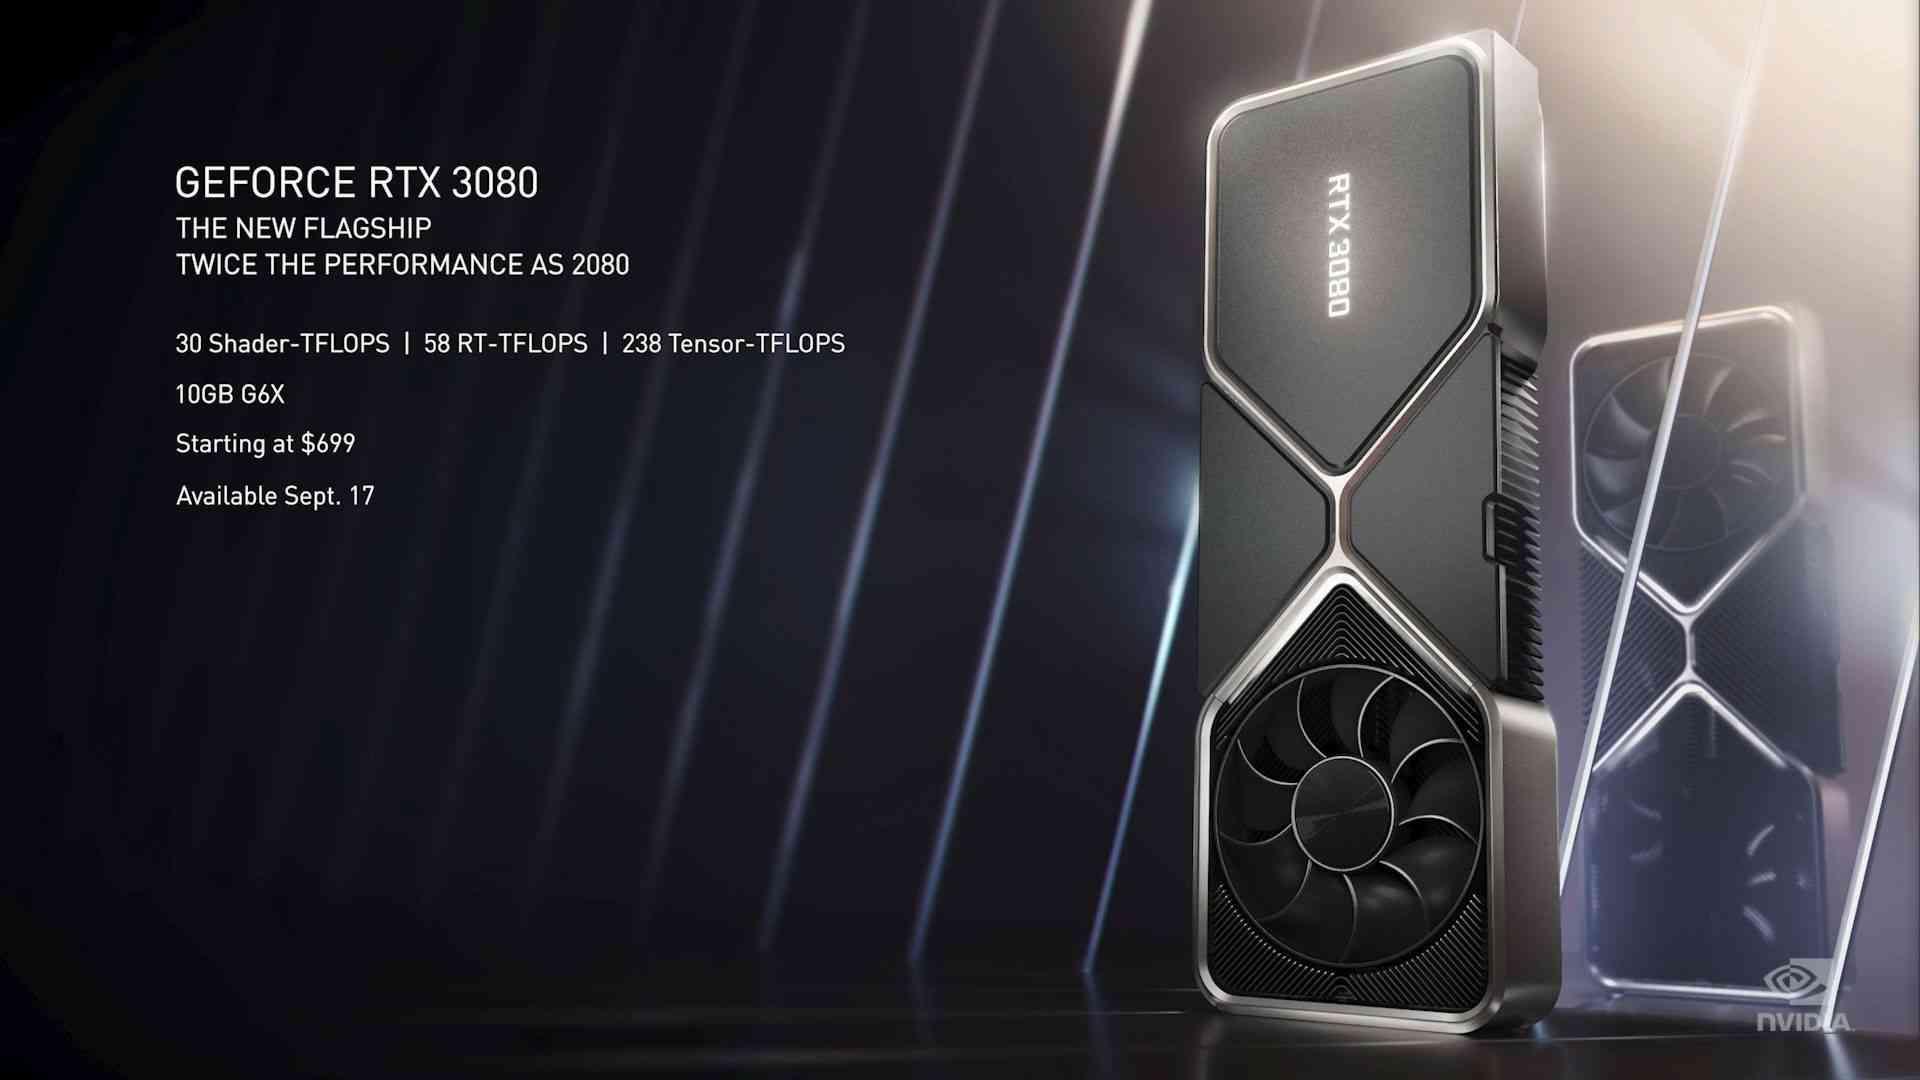 Nvidia RTX 3080 GPU Specs and Price